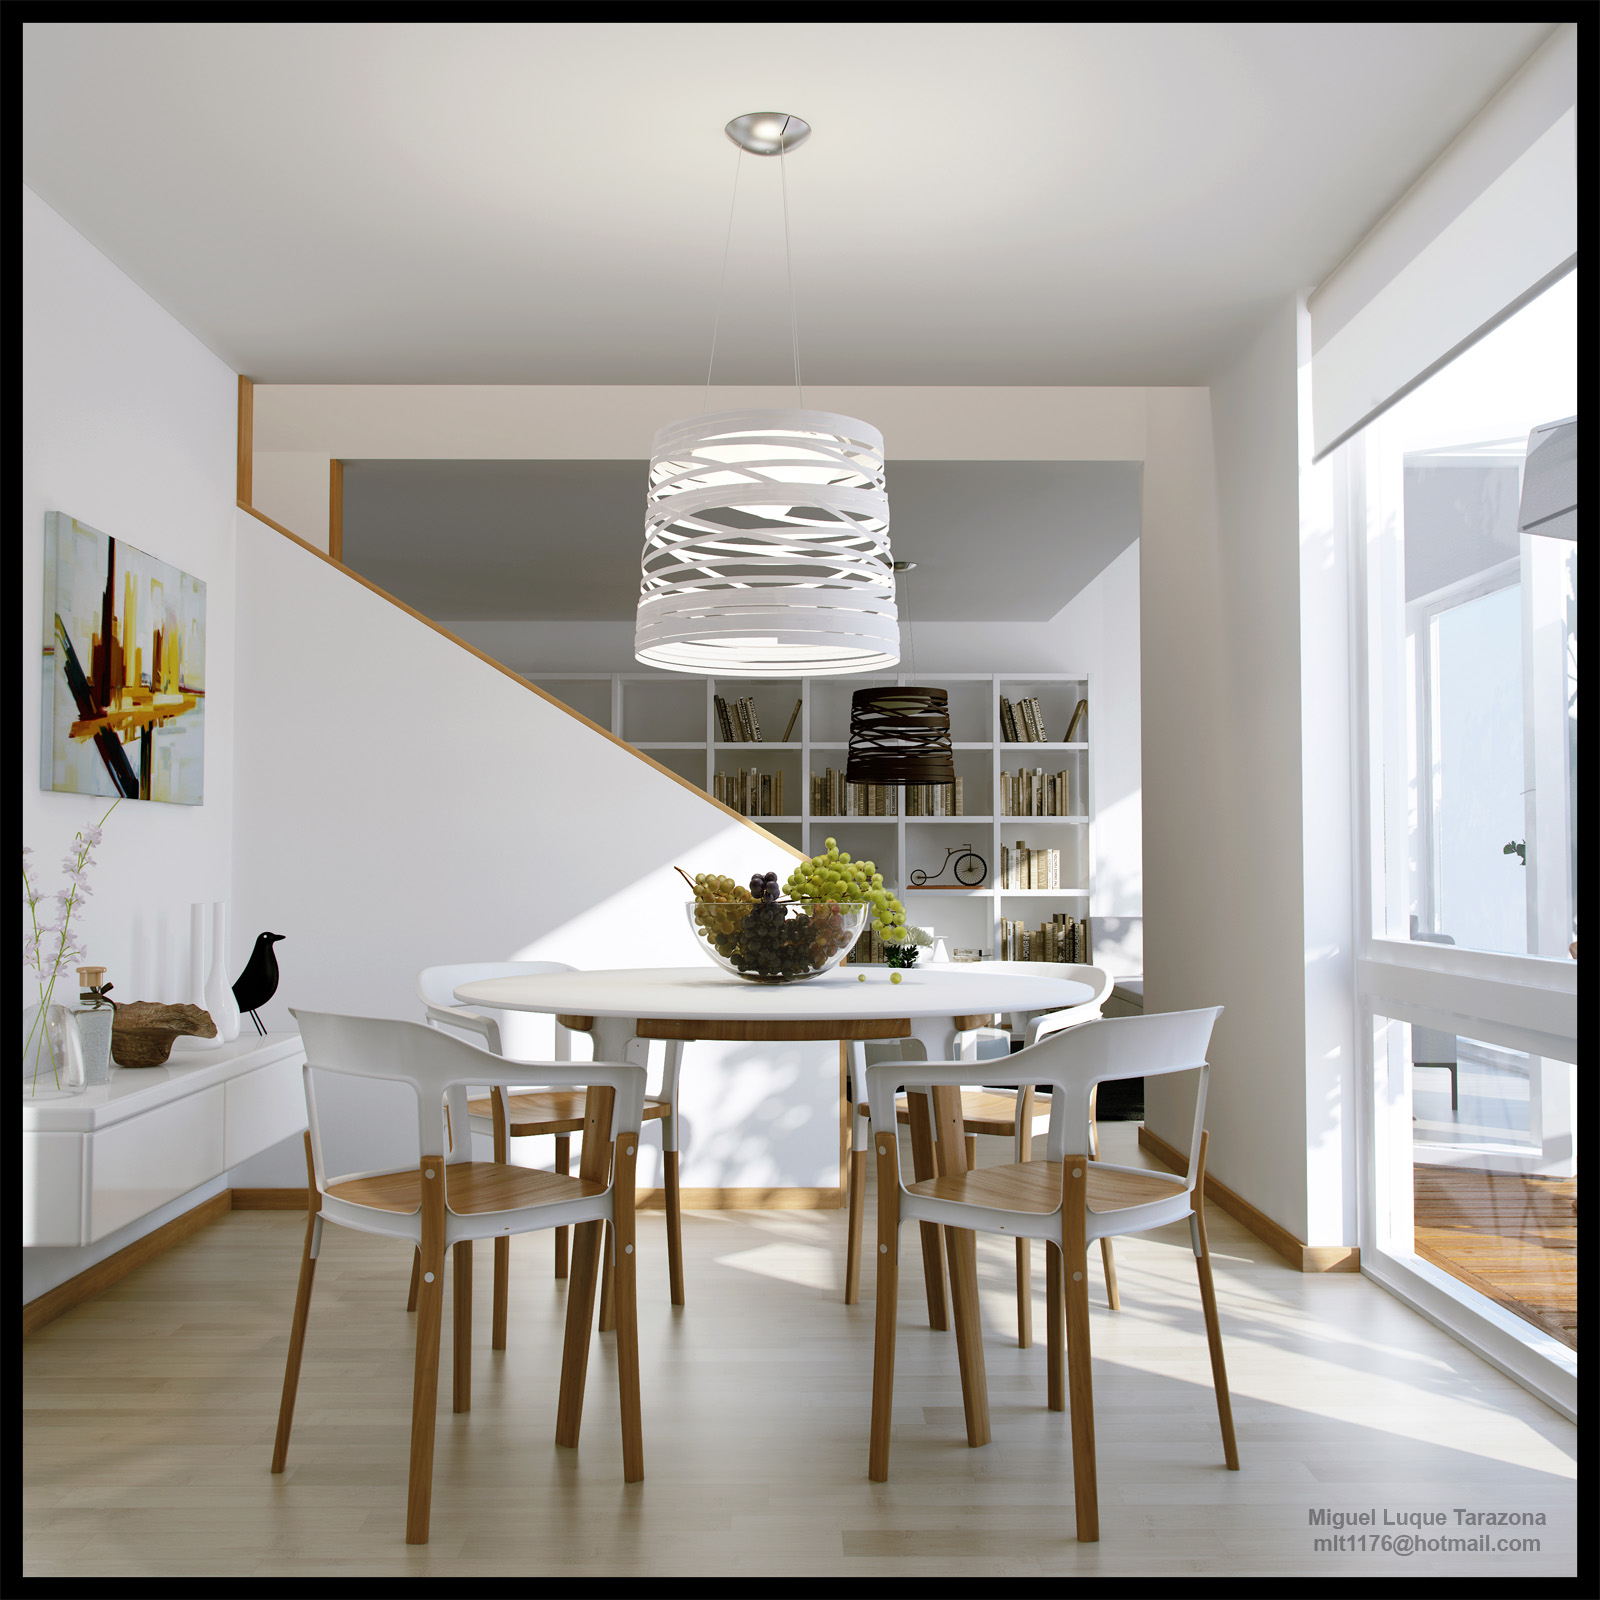 Cocina y comedor for Disenos de cocinas comedor modernas